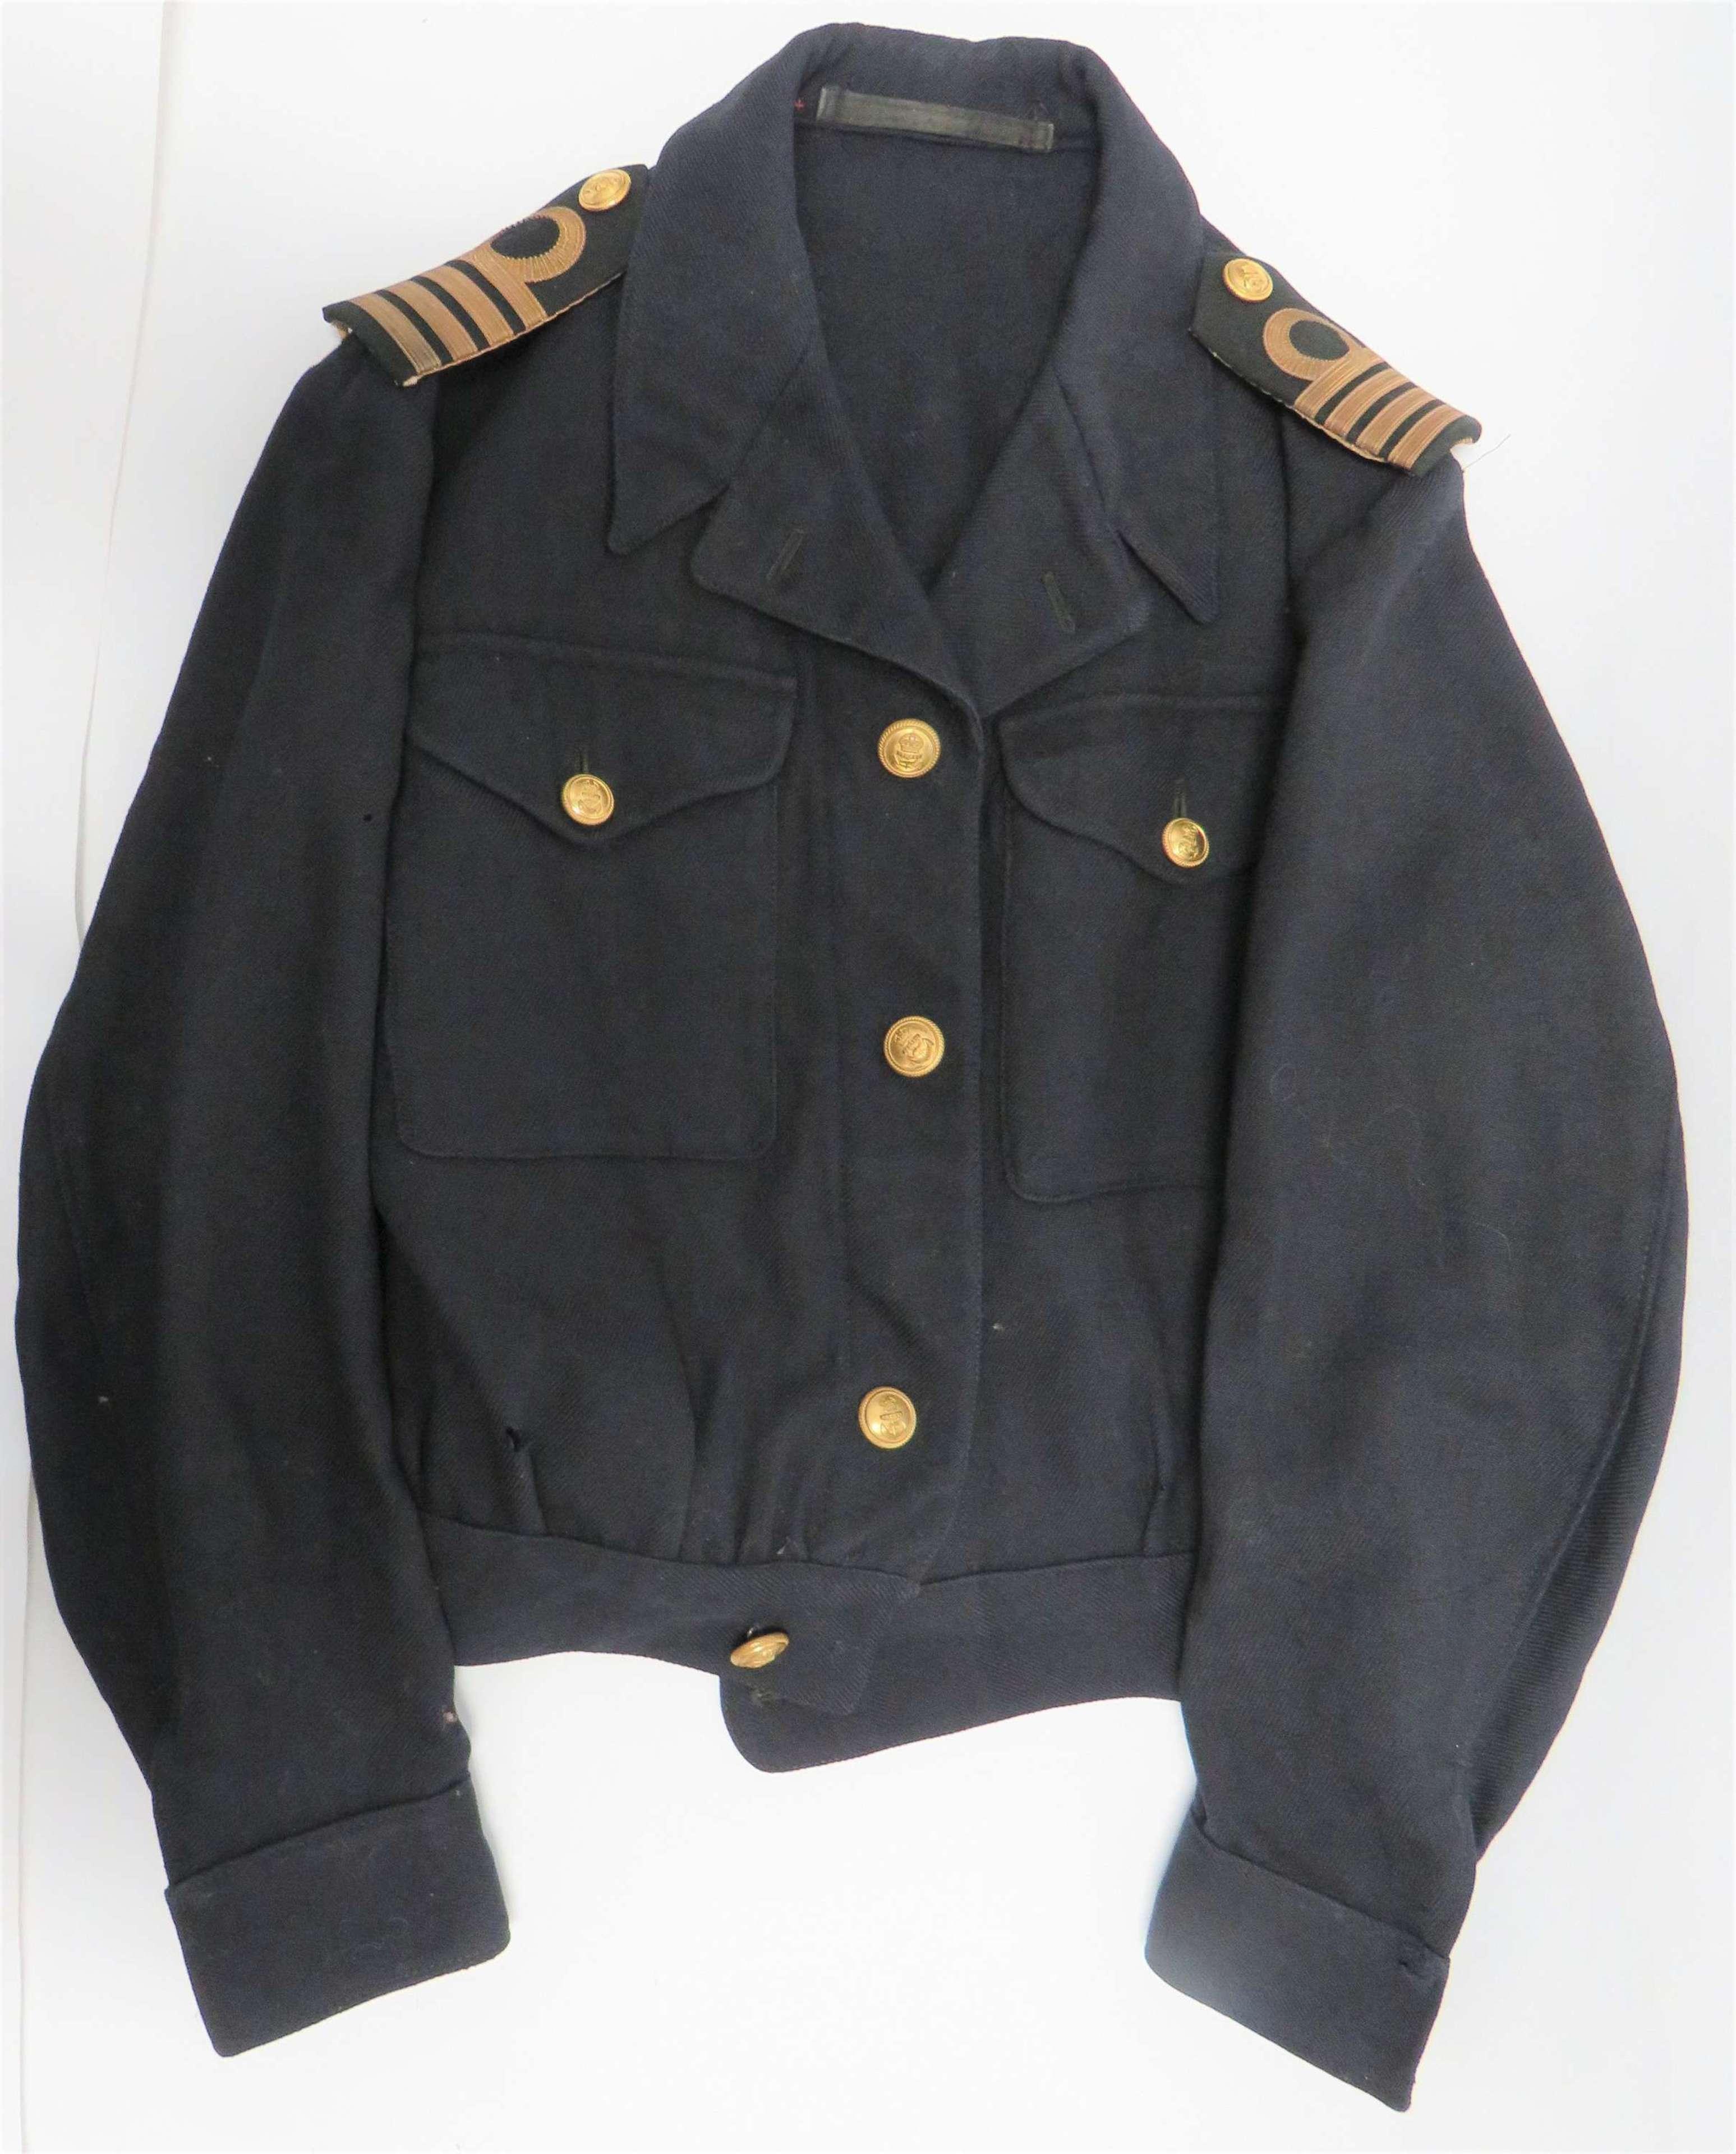 1944 Dated Royal Navy Captains Battle Dress Jacket